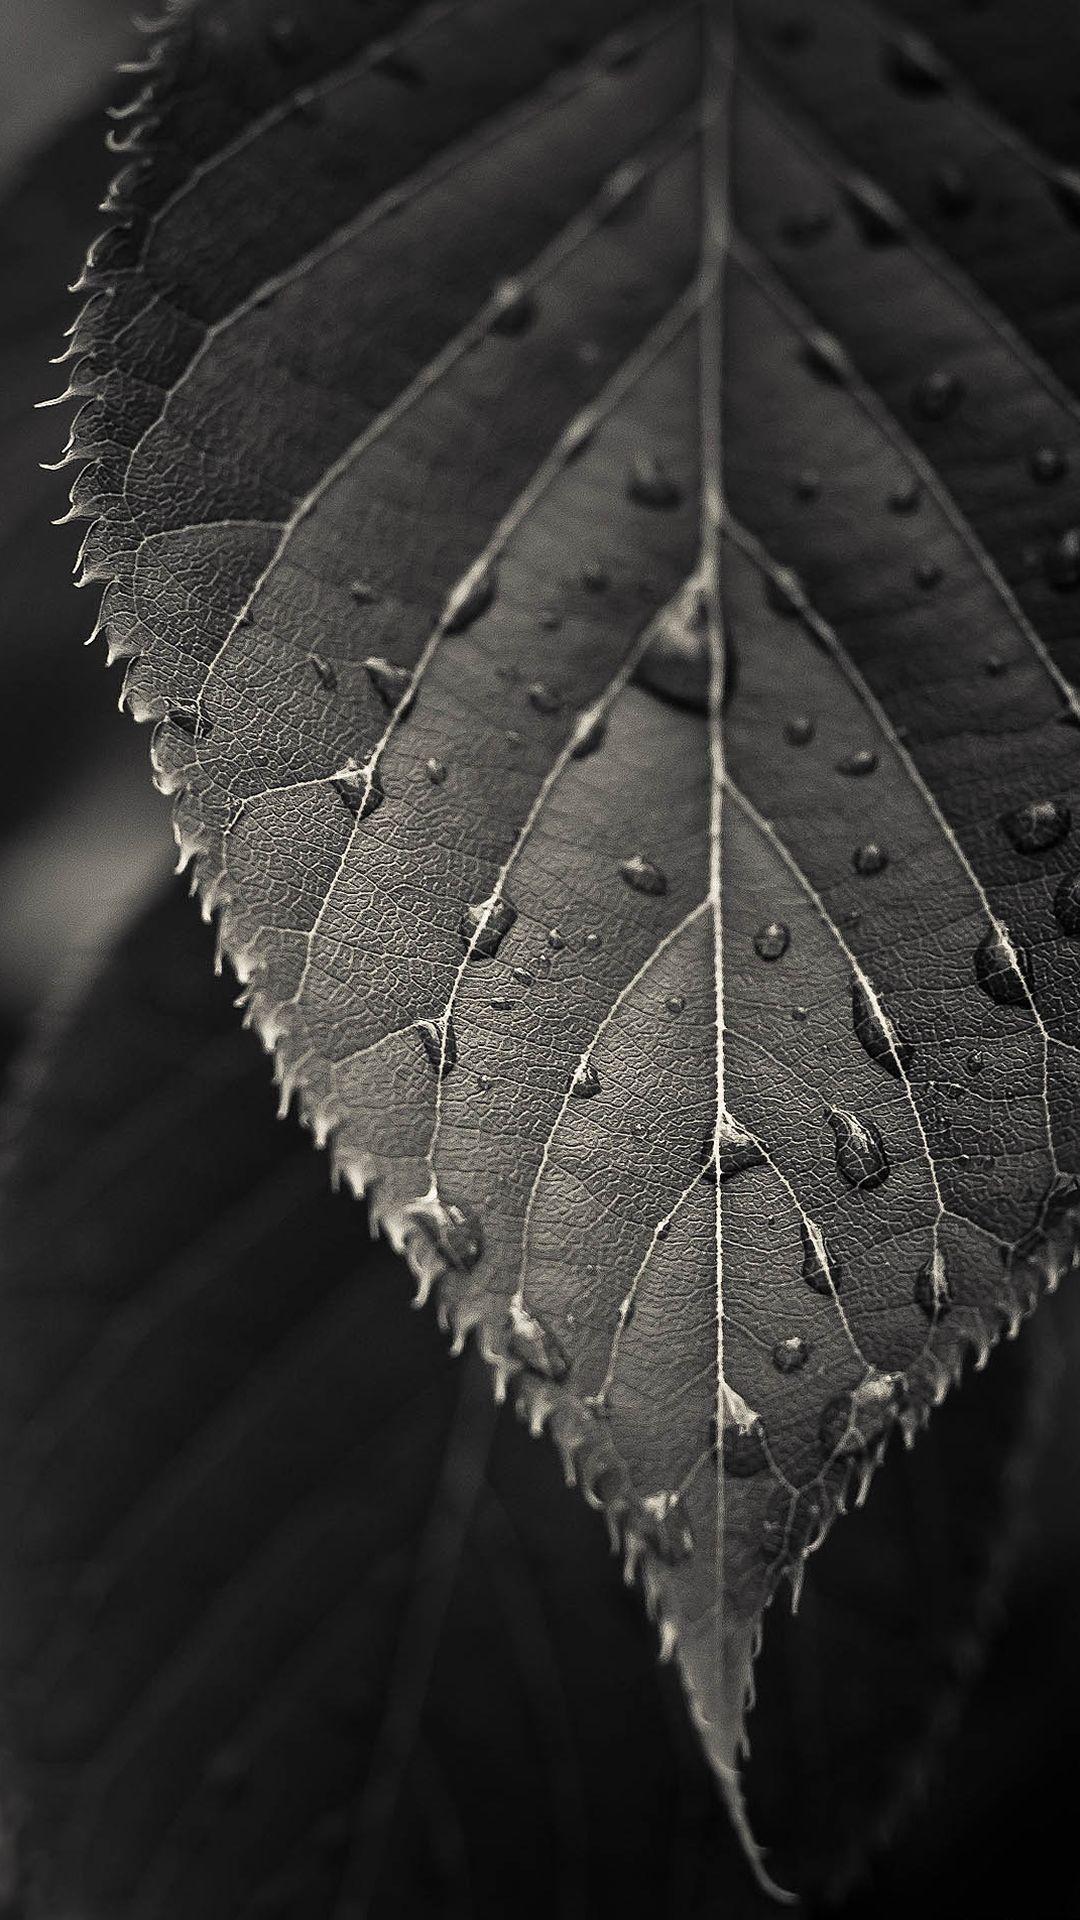 Gray Leaf Macro Iphone 7 Wallpaper Htc Wallpaper Dark Wallpaper Pretty Wallpaper Iphone